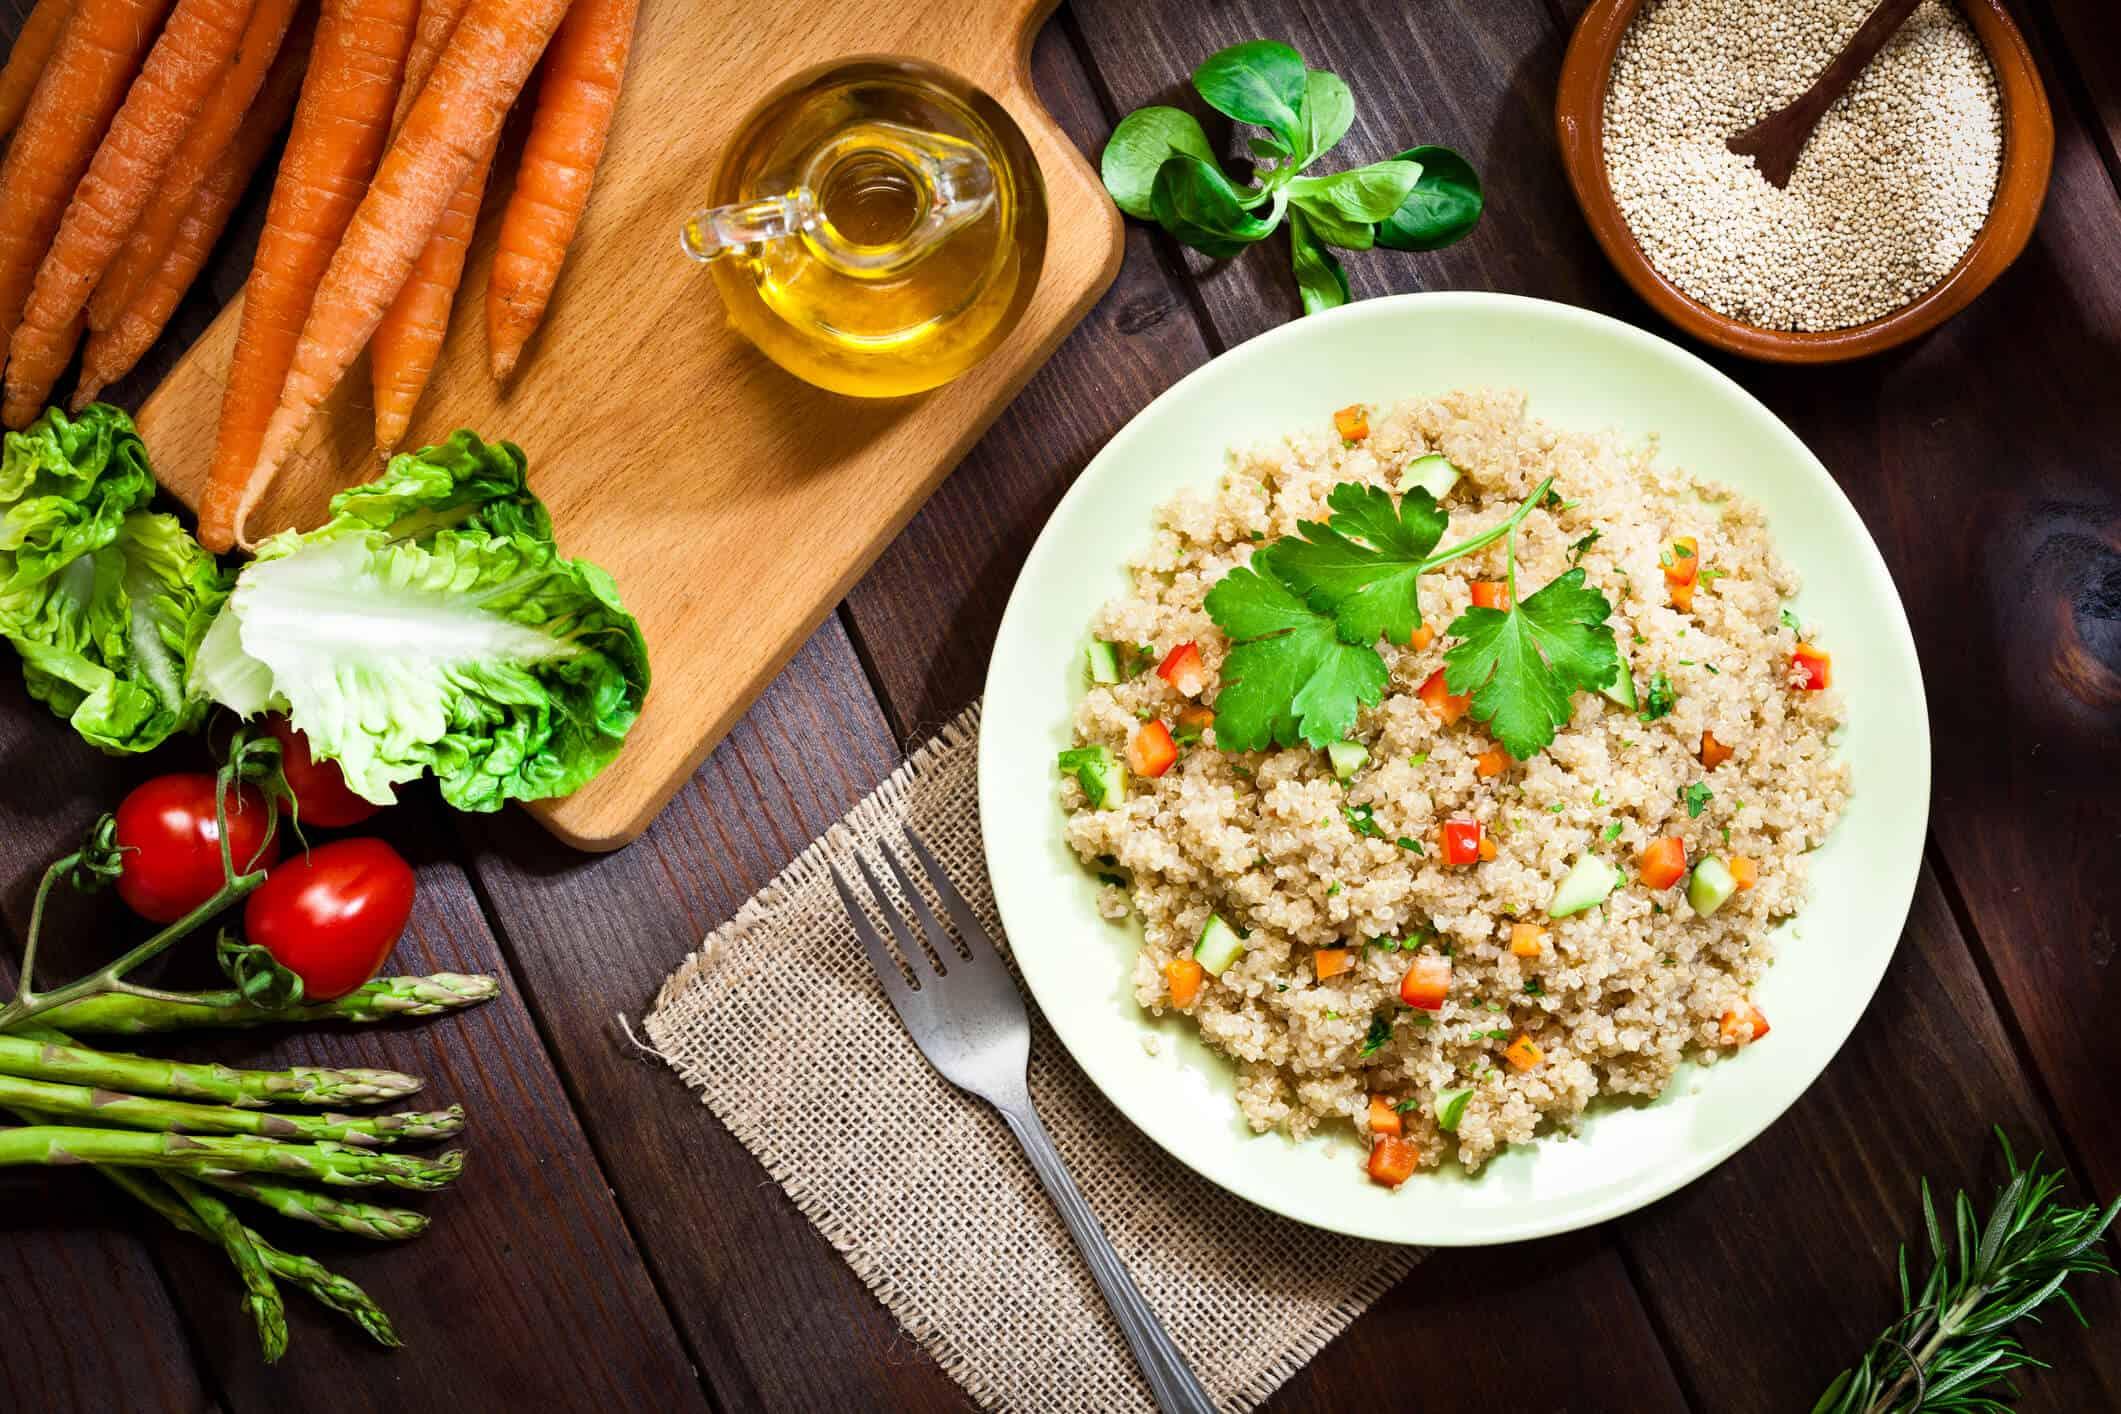 DietSpotlight Weight Loss Nutrition Meal Planning Diet Reviews